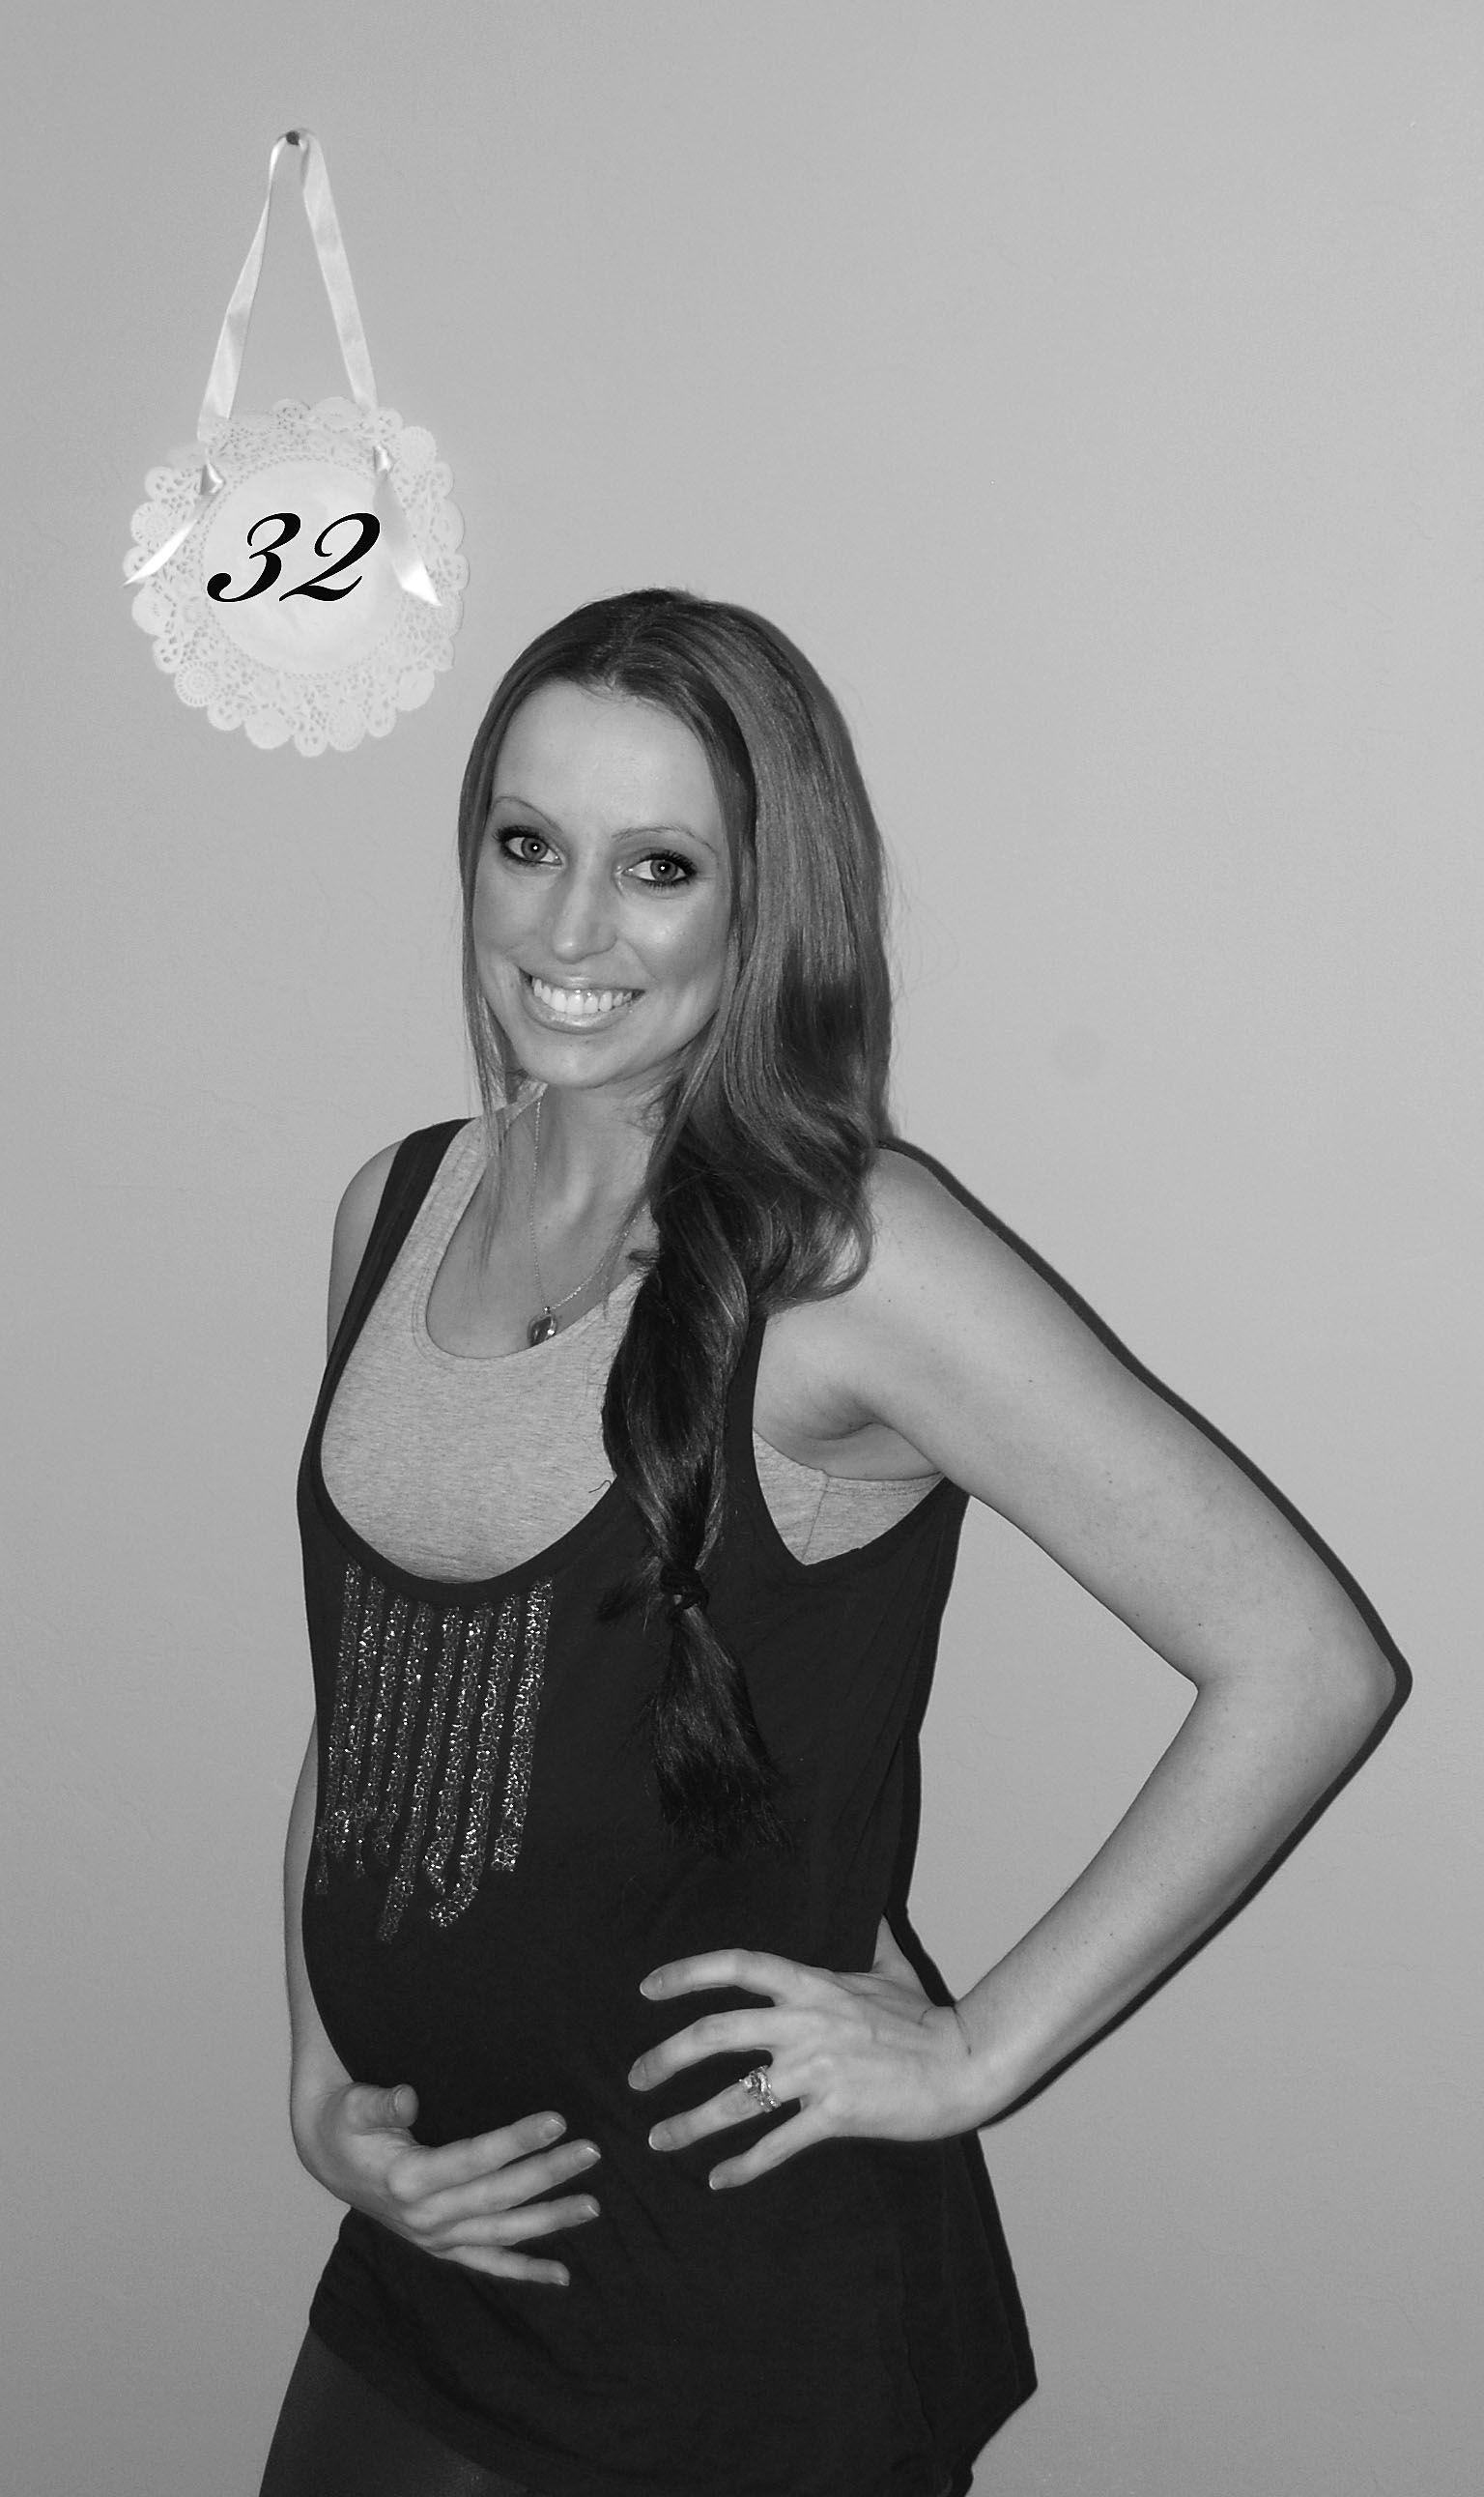 Week 32 8 months Pregnancy belly Still a flat ish belly button